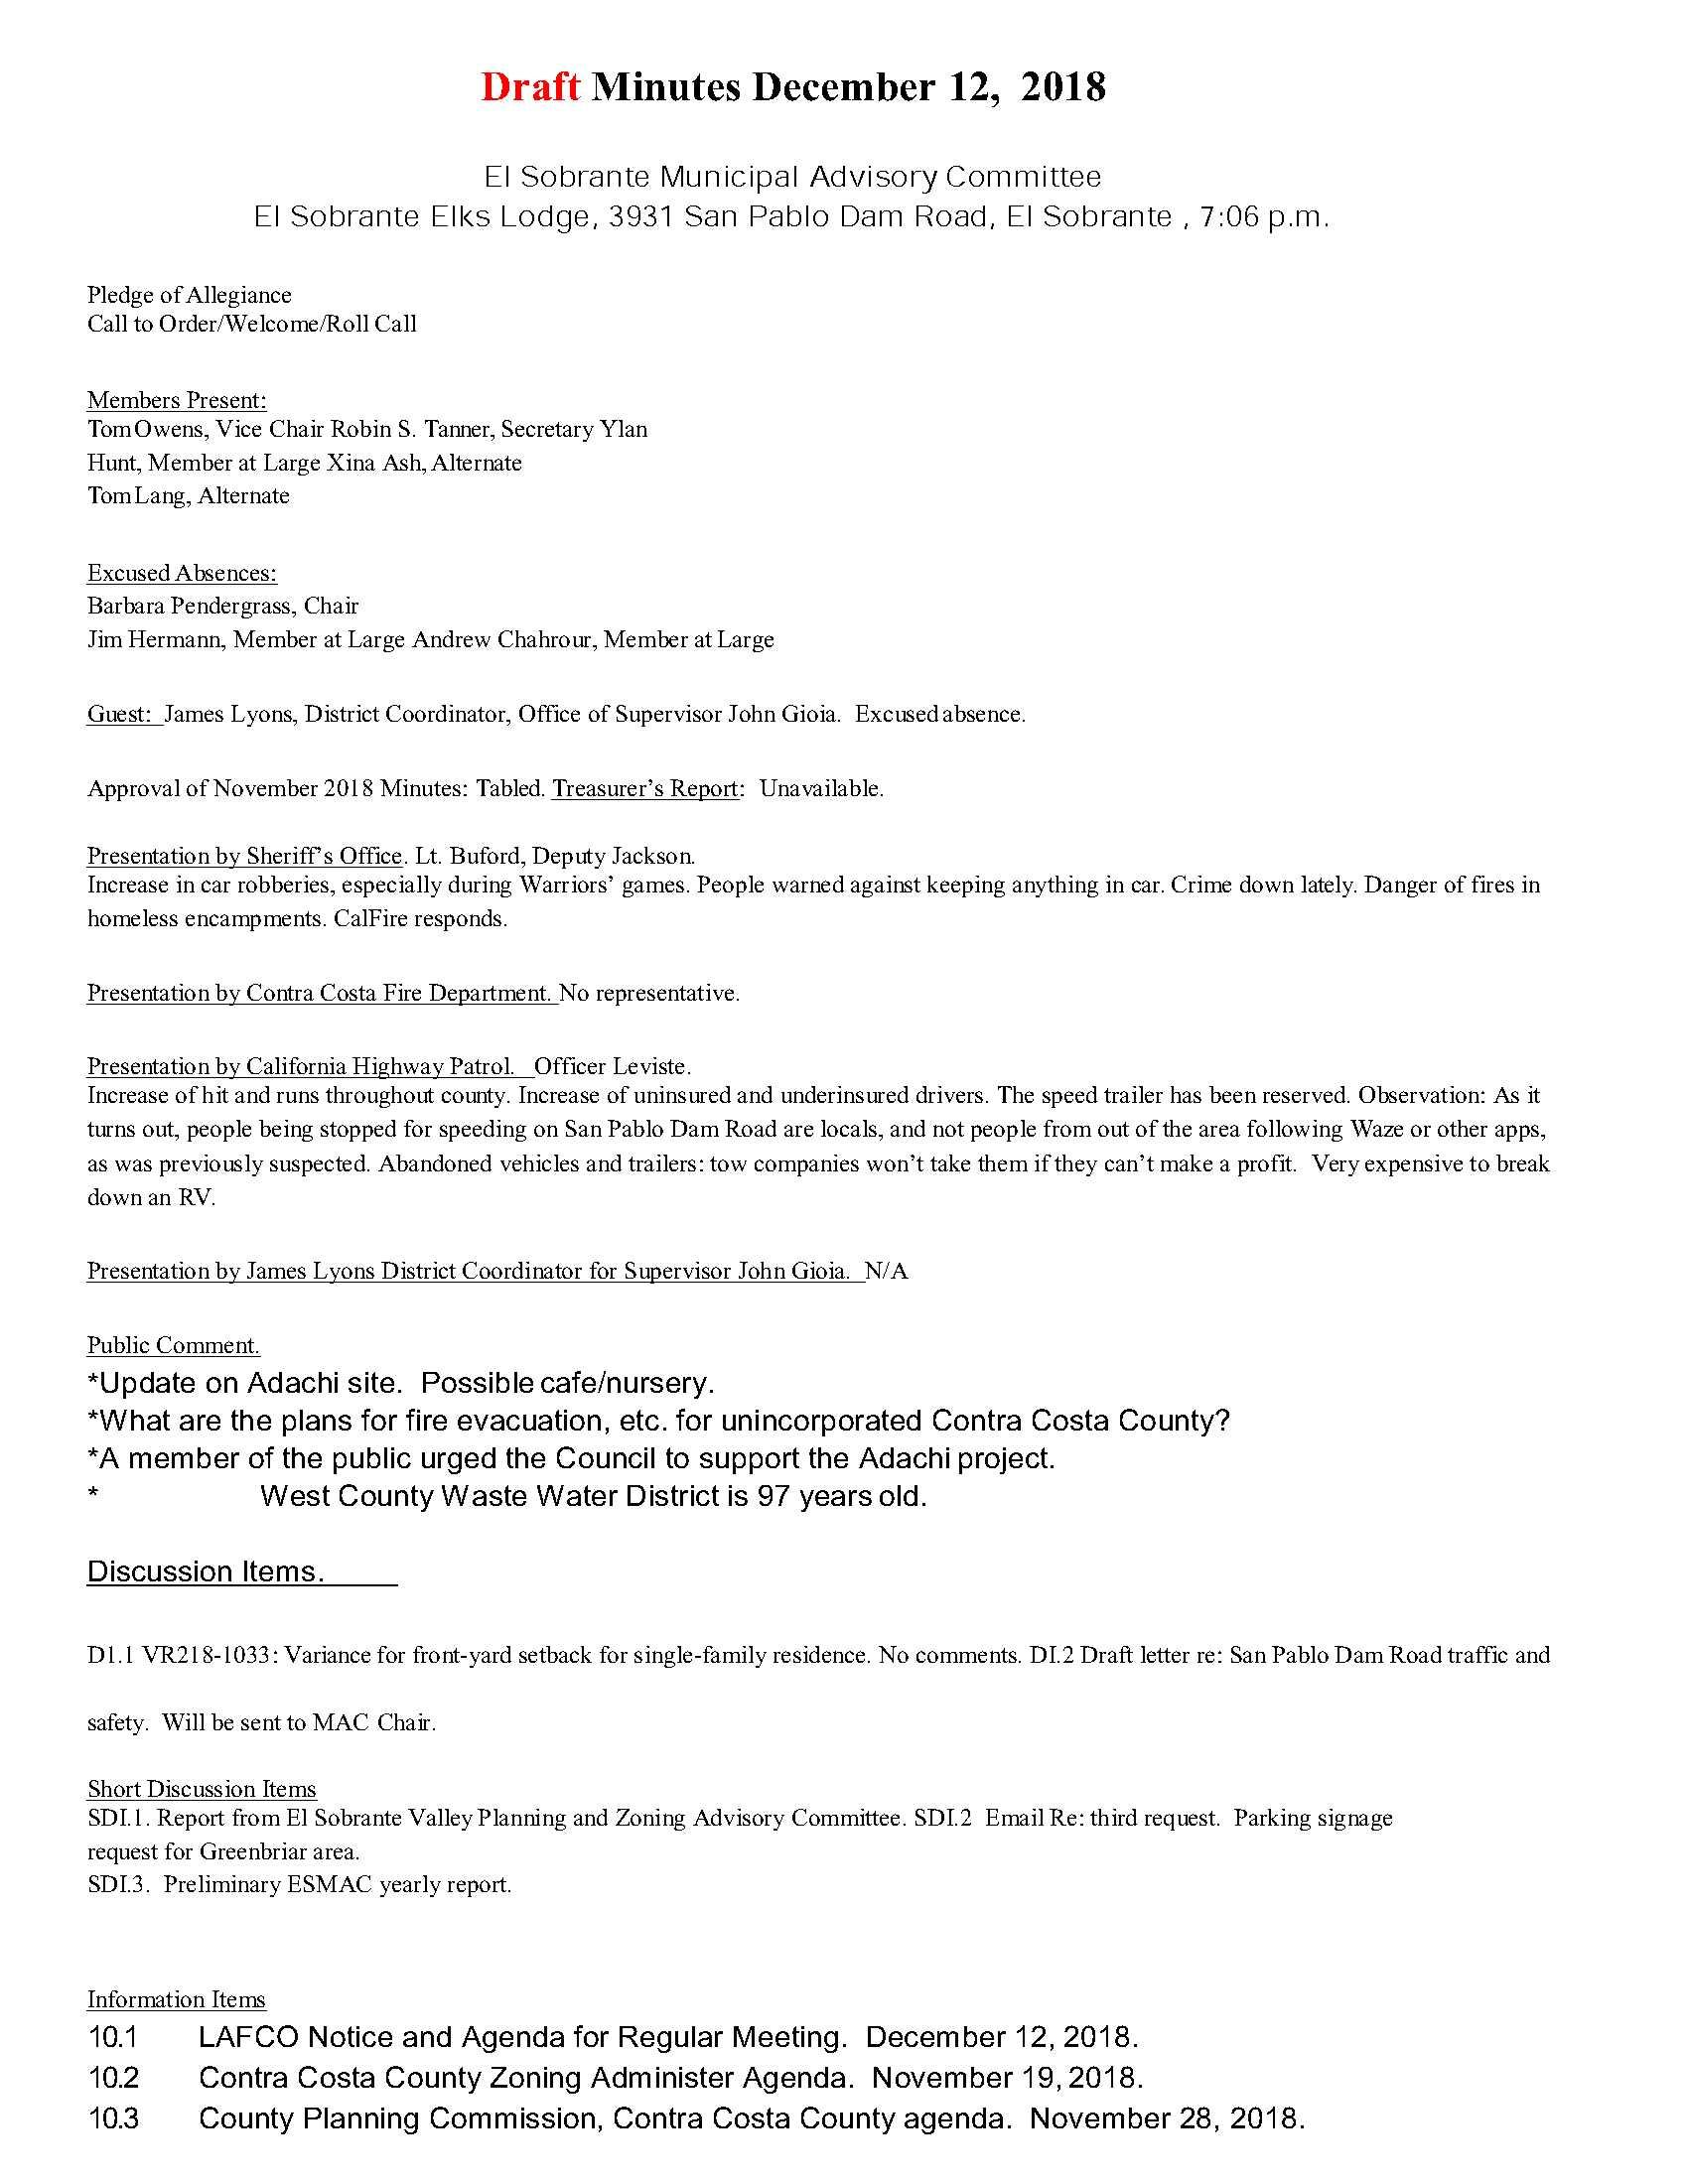 ESMAC Agenda 1.9.2019 (34 Pages)_5.jpg